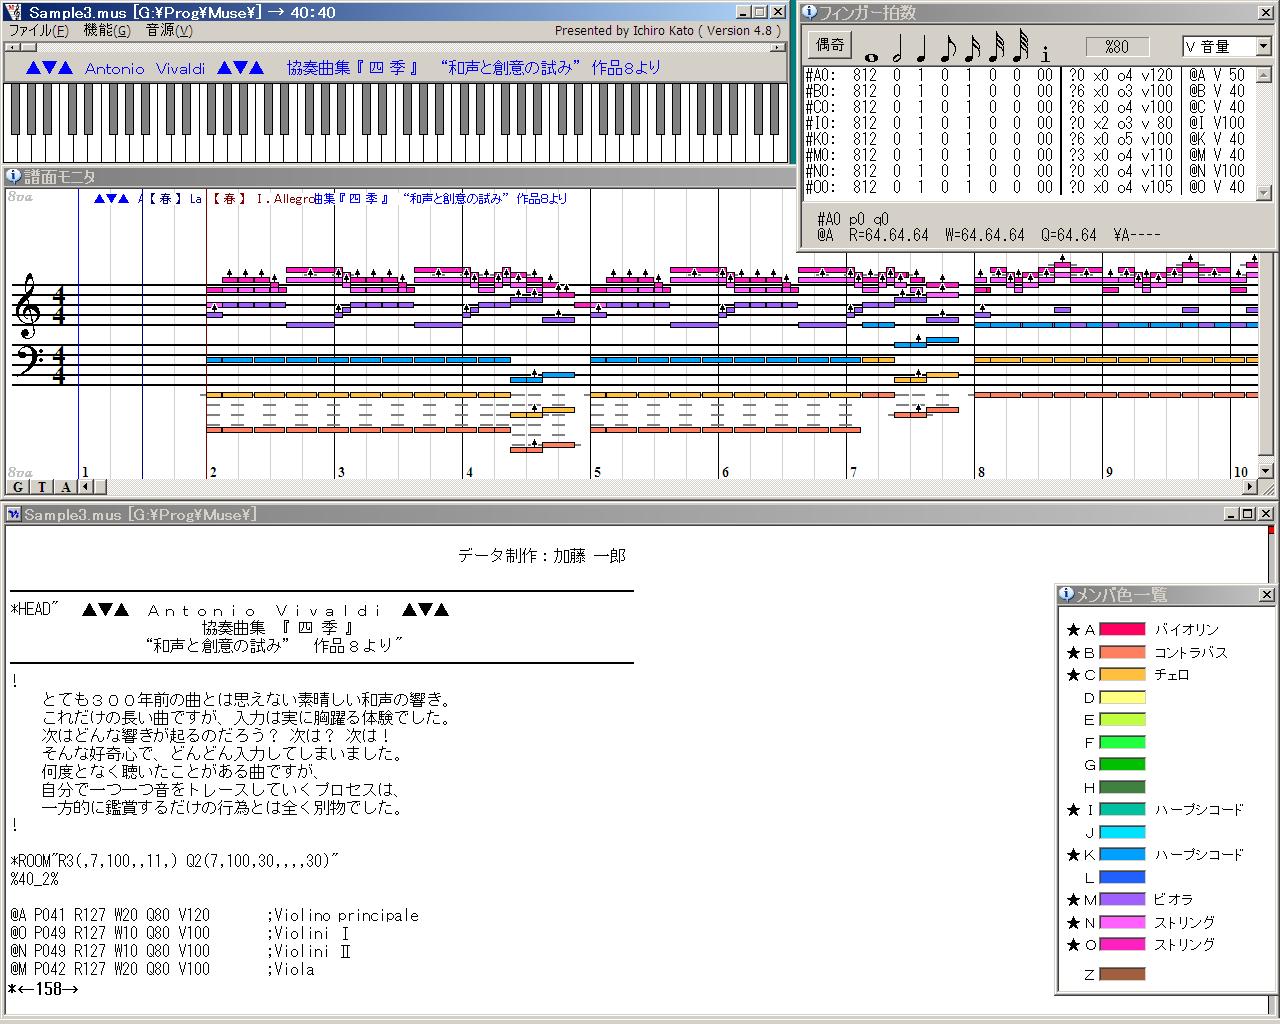 http://musewiki.dip.jp/desk/kato.png